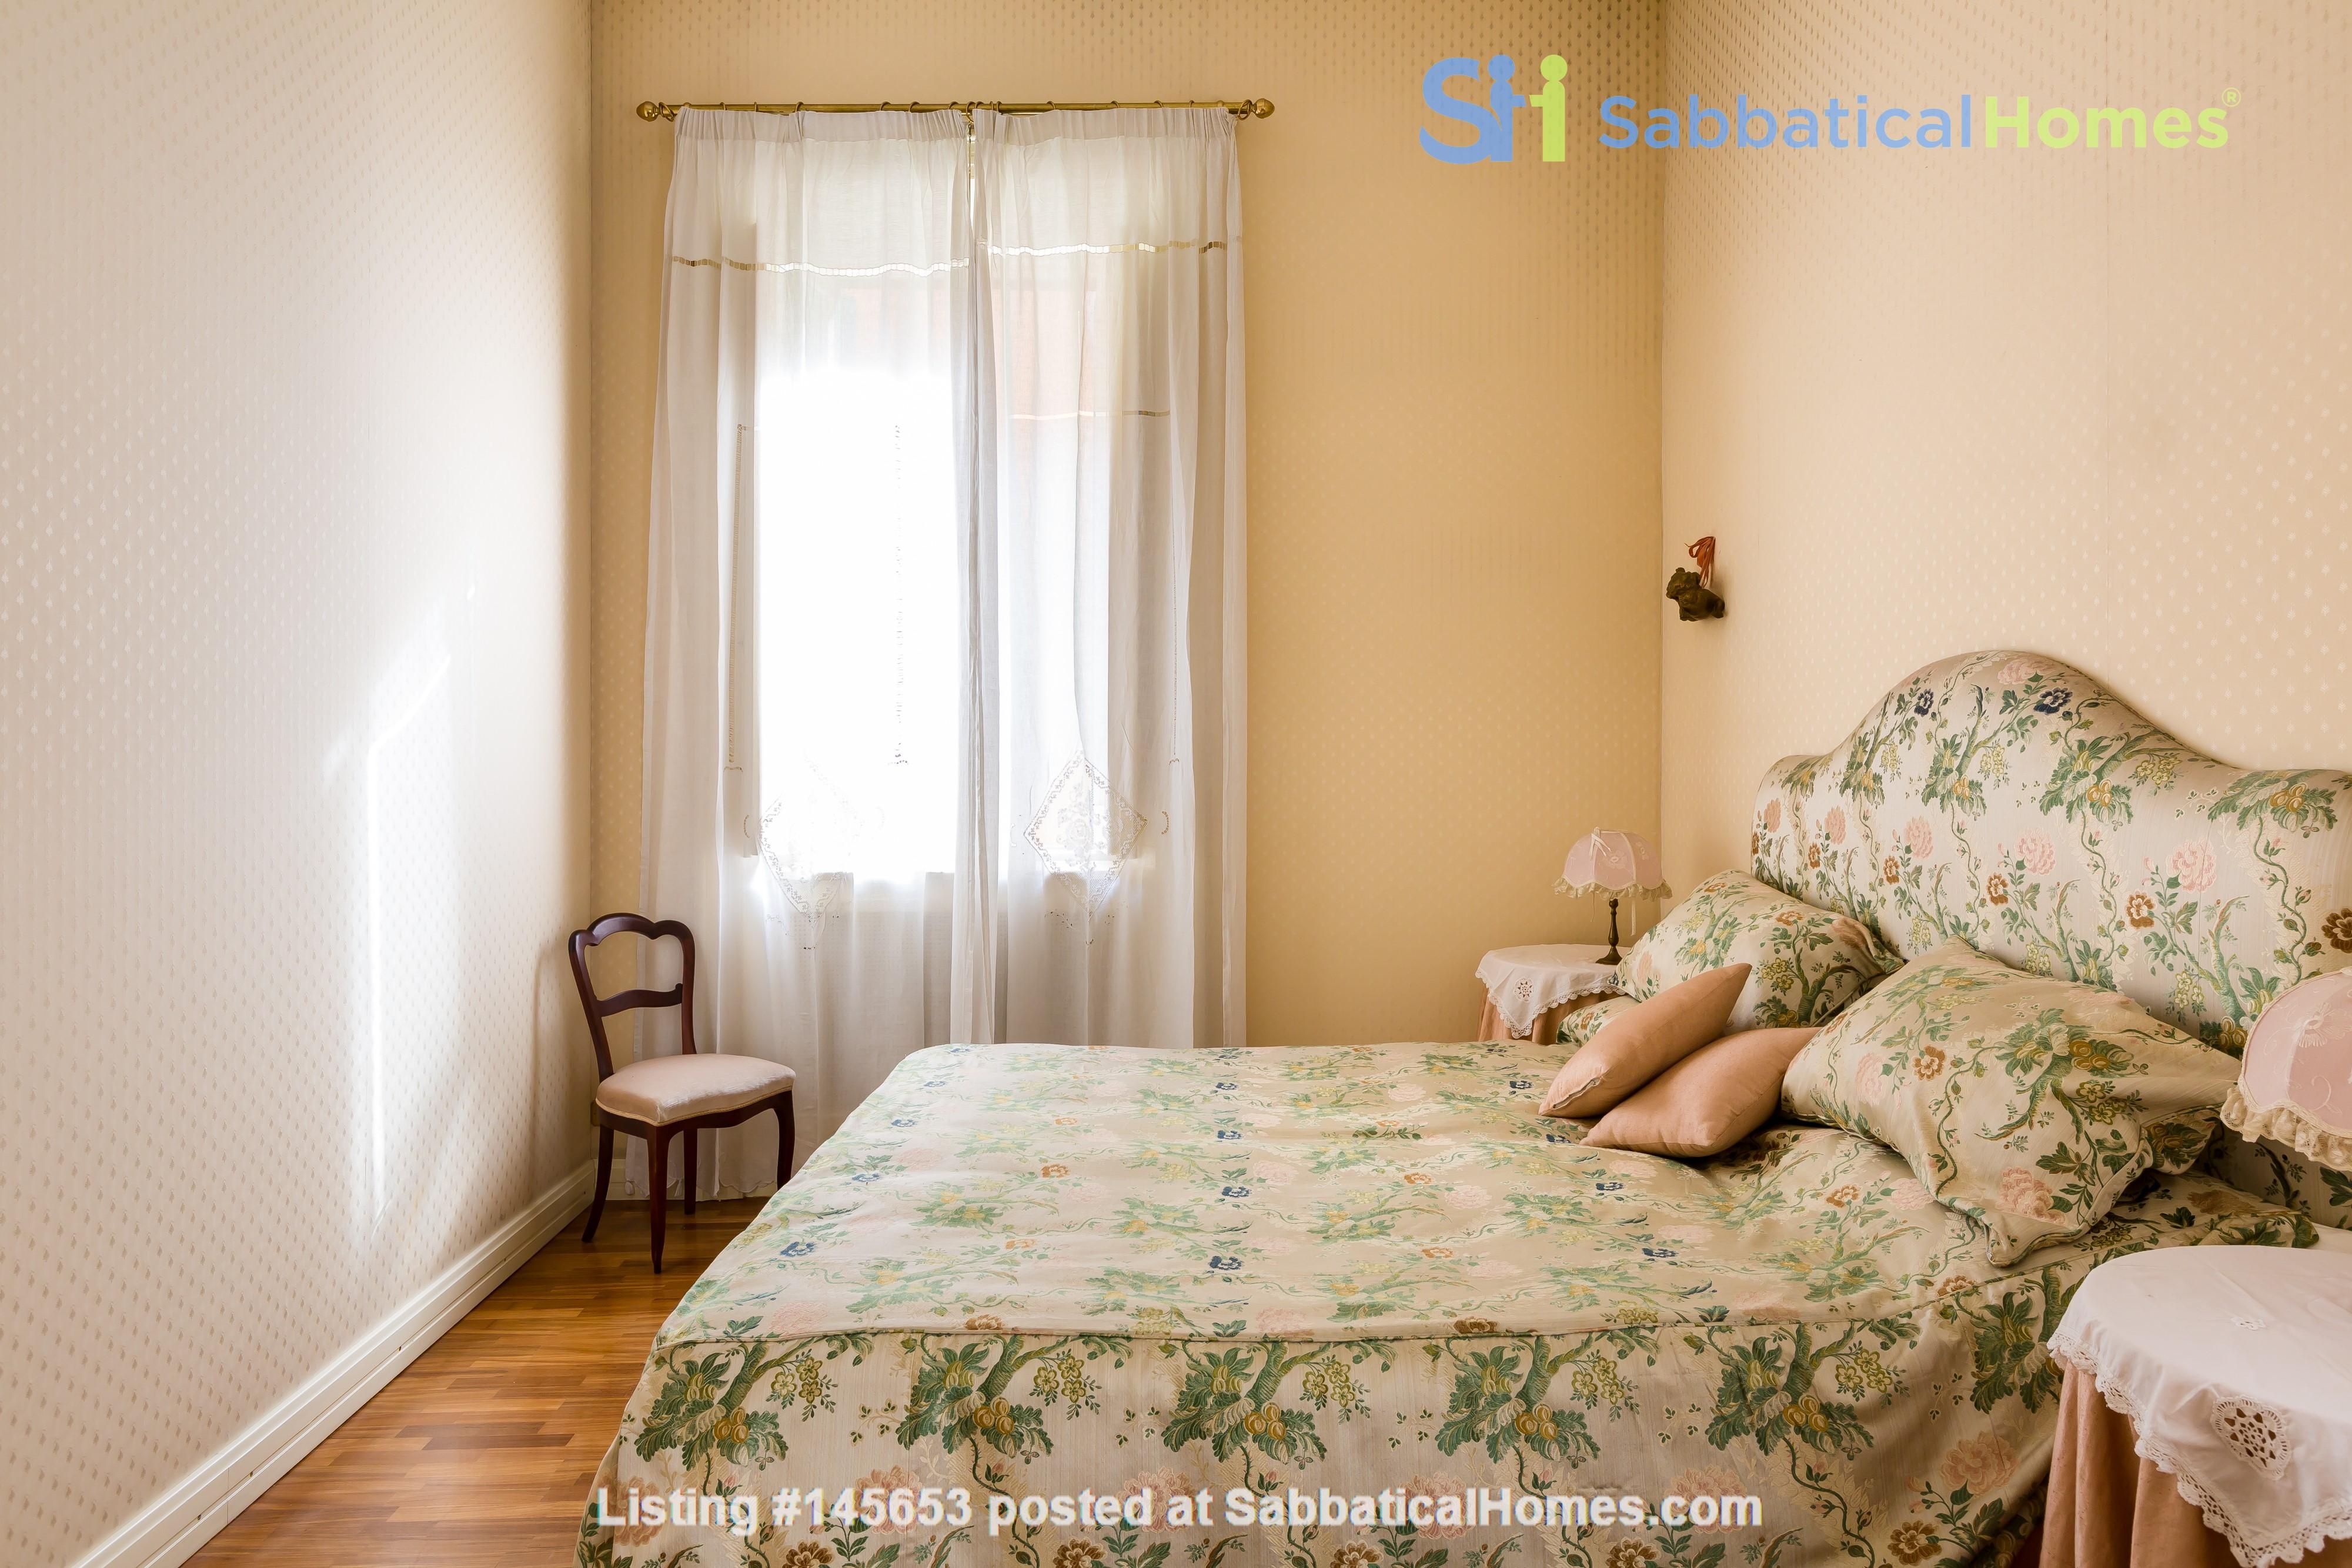 EMMA SPAGNA APARTMENT Home Rental in Roma, Lazio, Italy 3